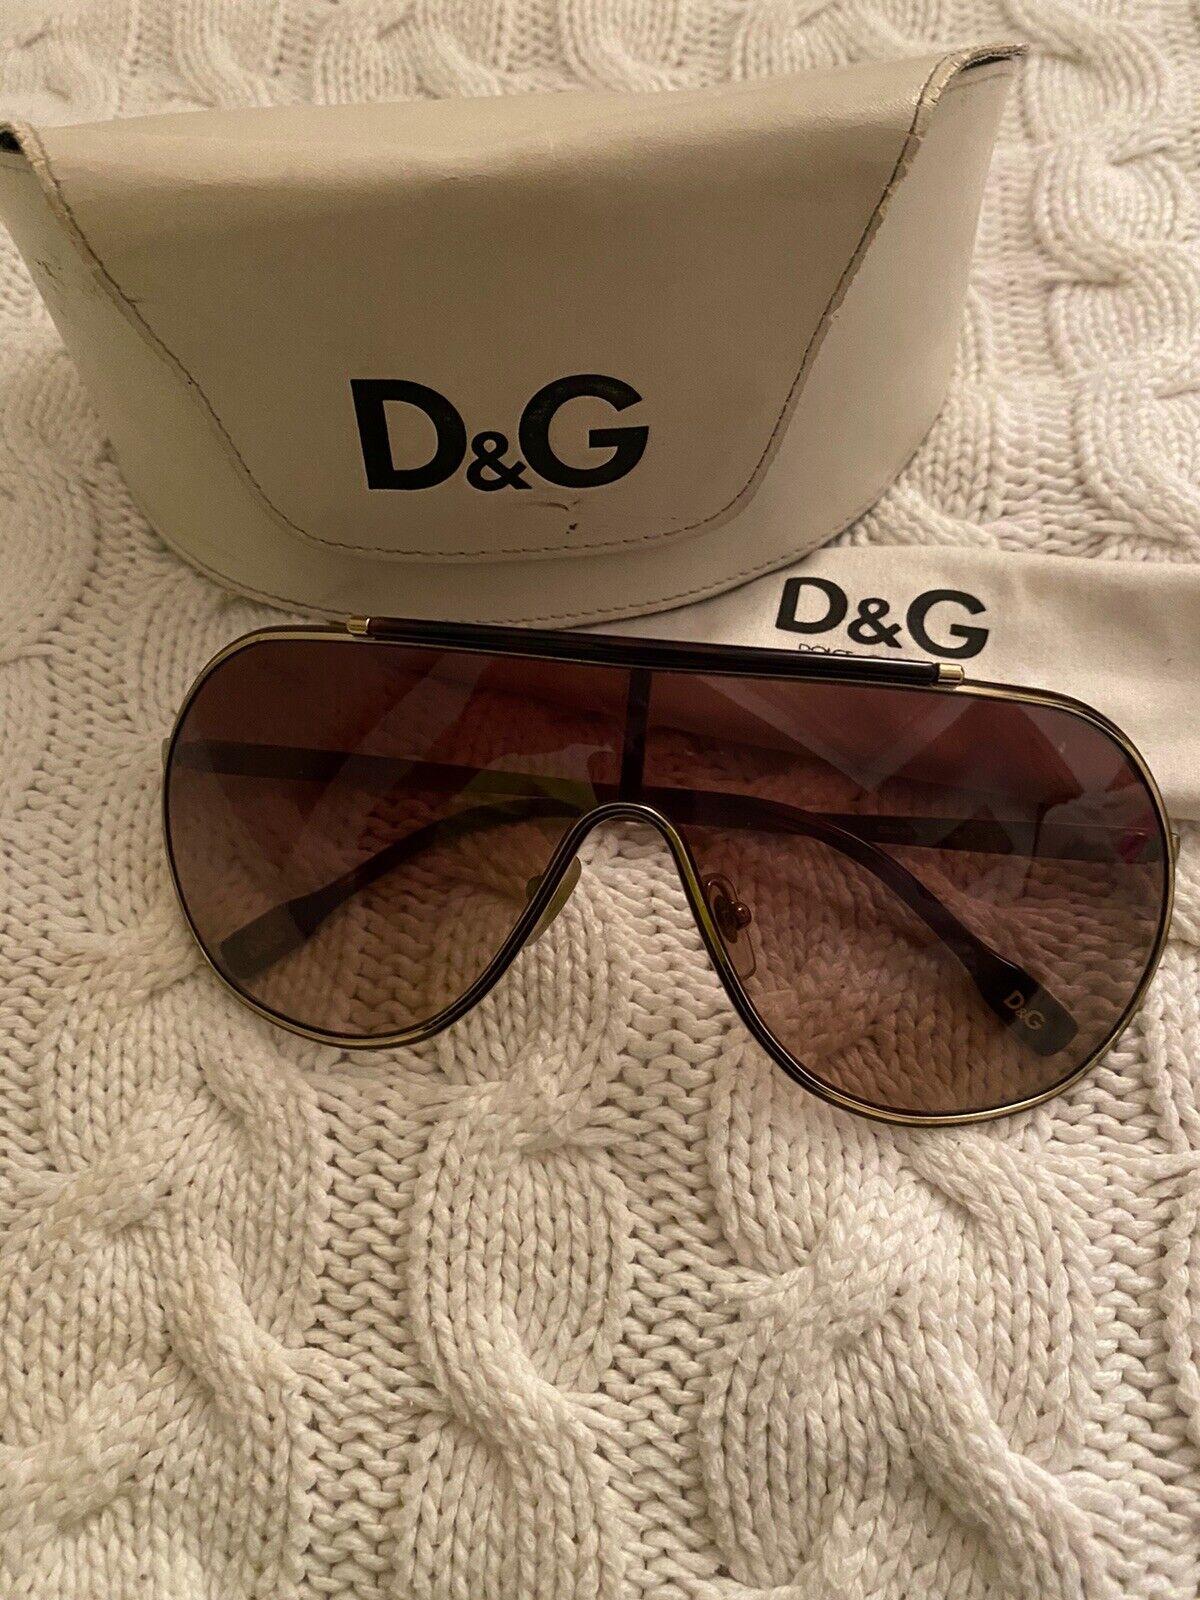 D&G Dolce Gabbana Gold Tone Aviators Sunglasses Offers Accepted